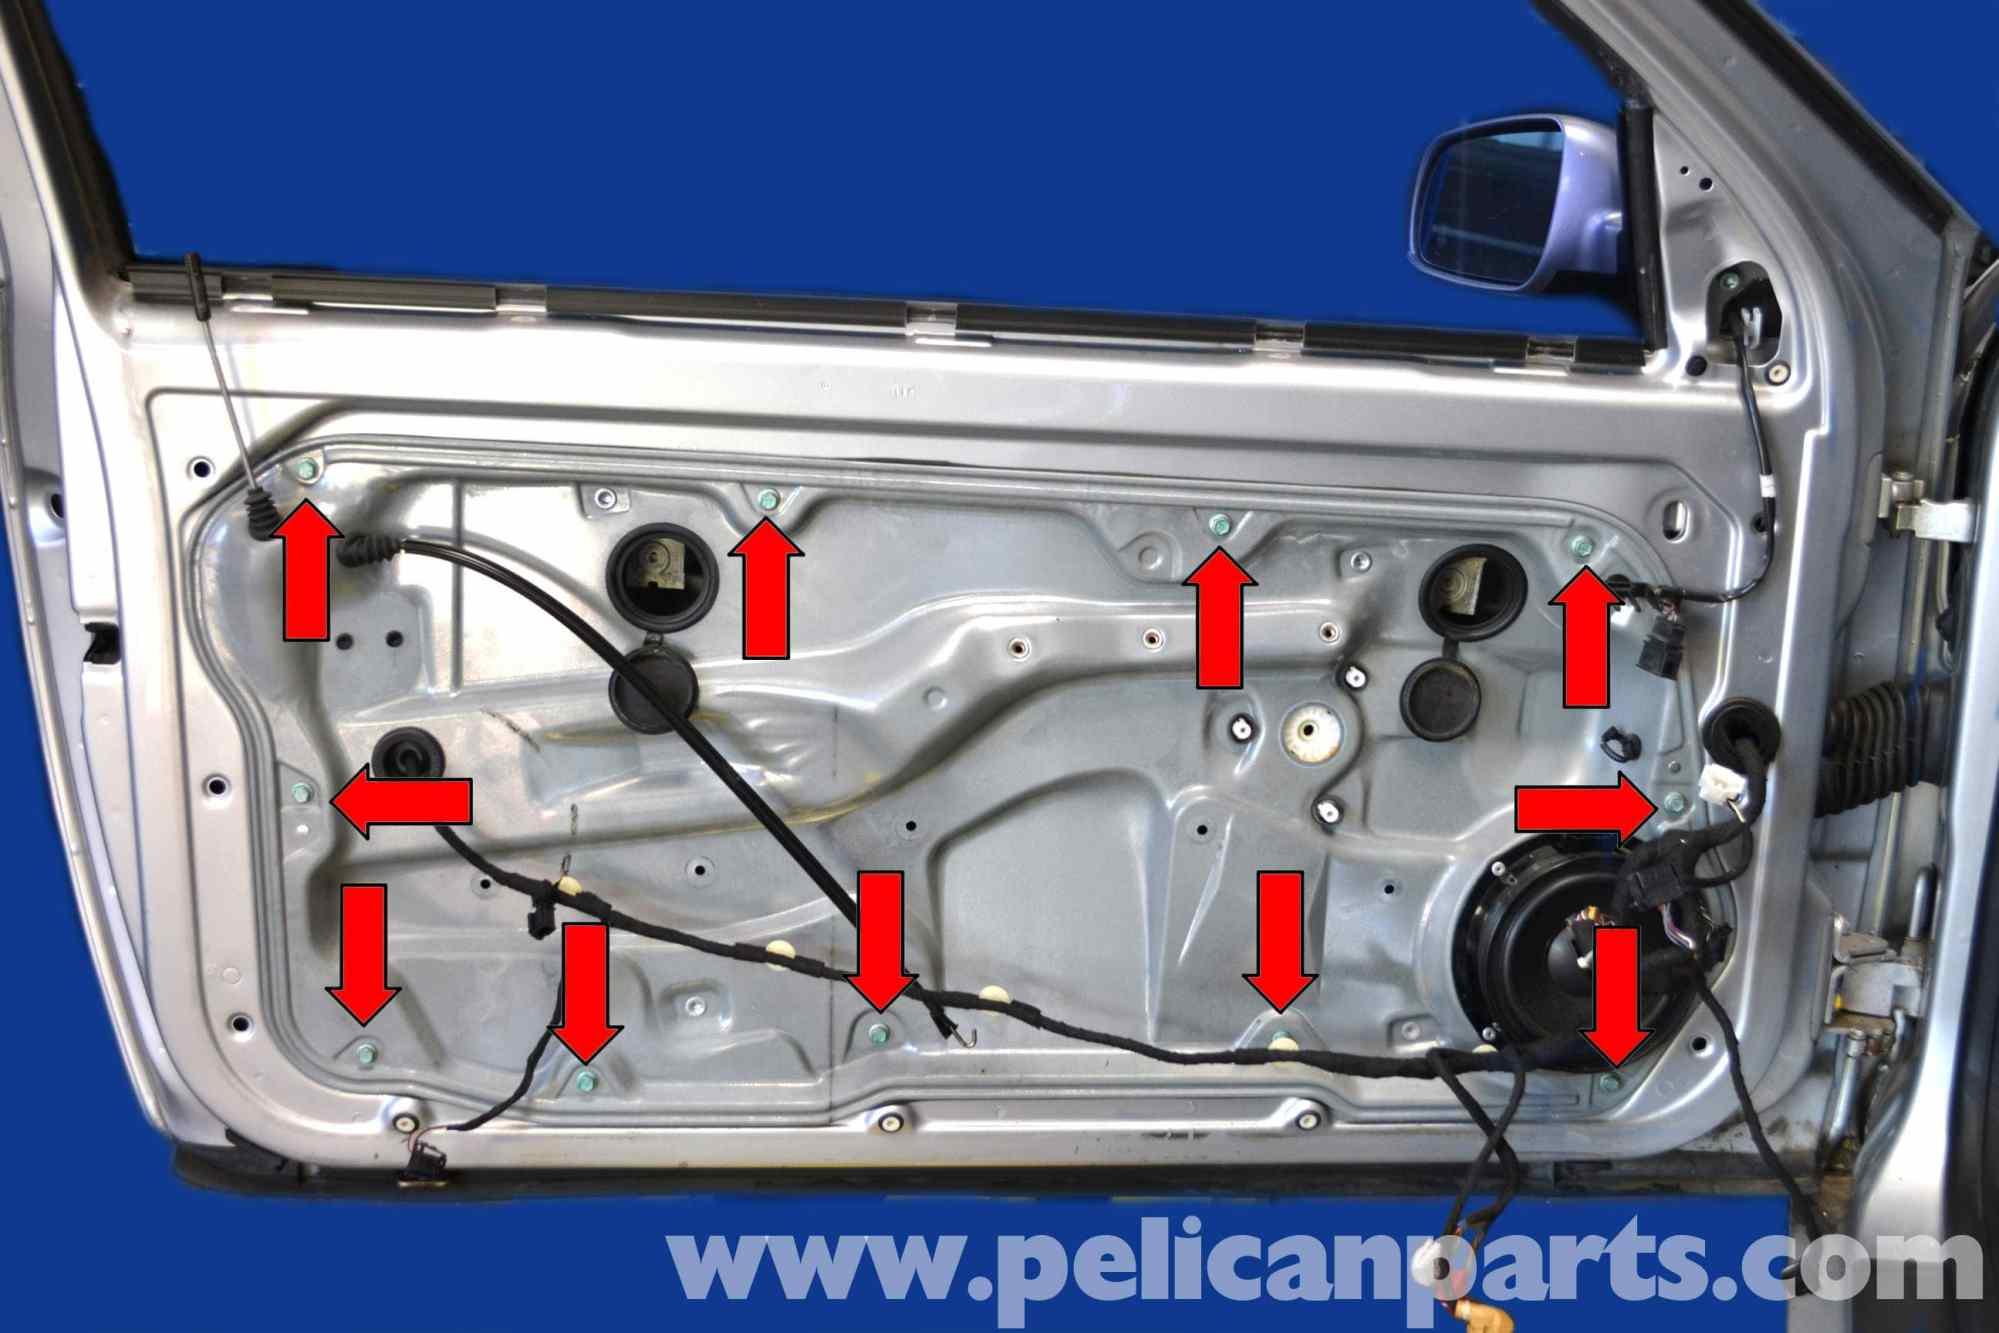 hight resolution of volkswagen golf gti mk iv window regulator replacement 1999 2005 pelican parts diy 1995 vw jetta engine diagram 2000 vw jetta wiring diagram